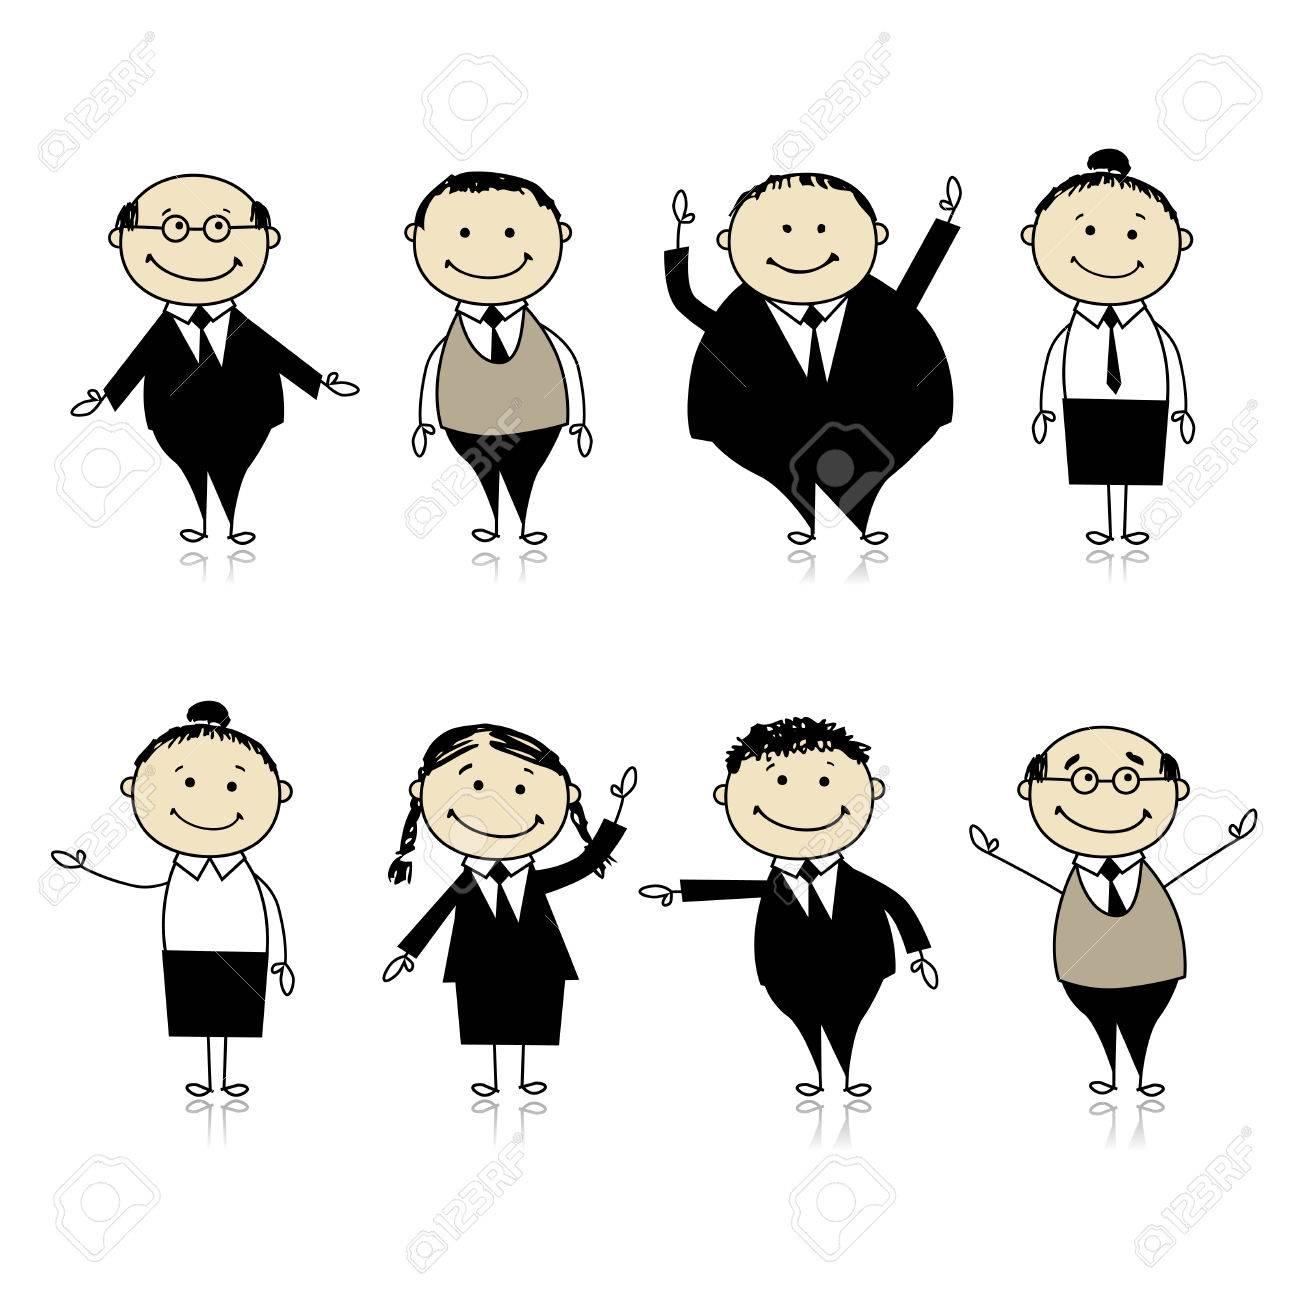 Business team cartoon characters cartoon vector cartoondealer com - Salesman Cartoon Set Of Business Persons For Your Design Illustration